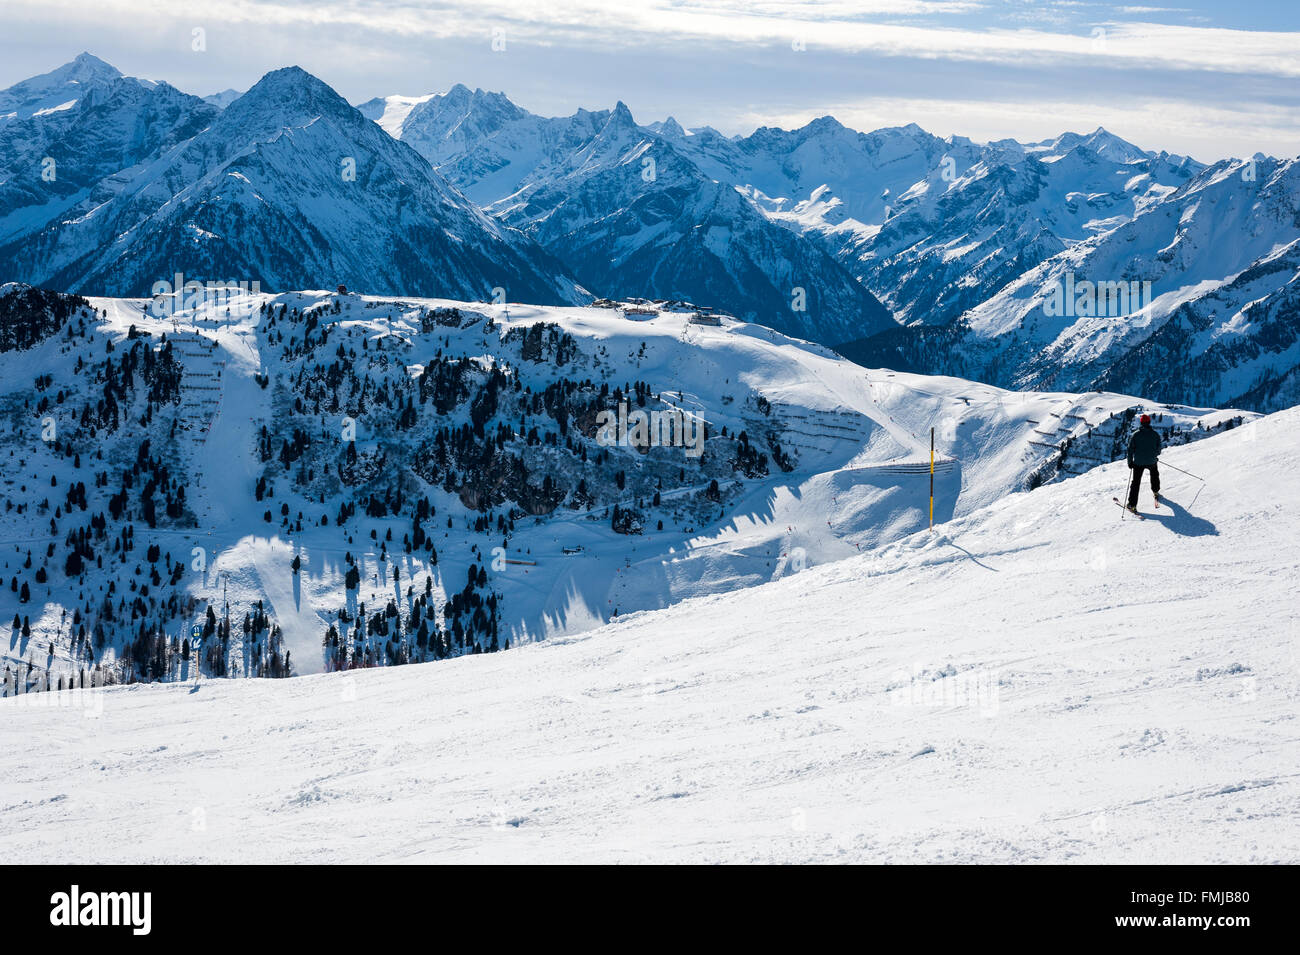 Mayrhofen ski area in Austrian Alps - Stock Image